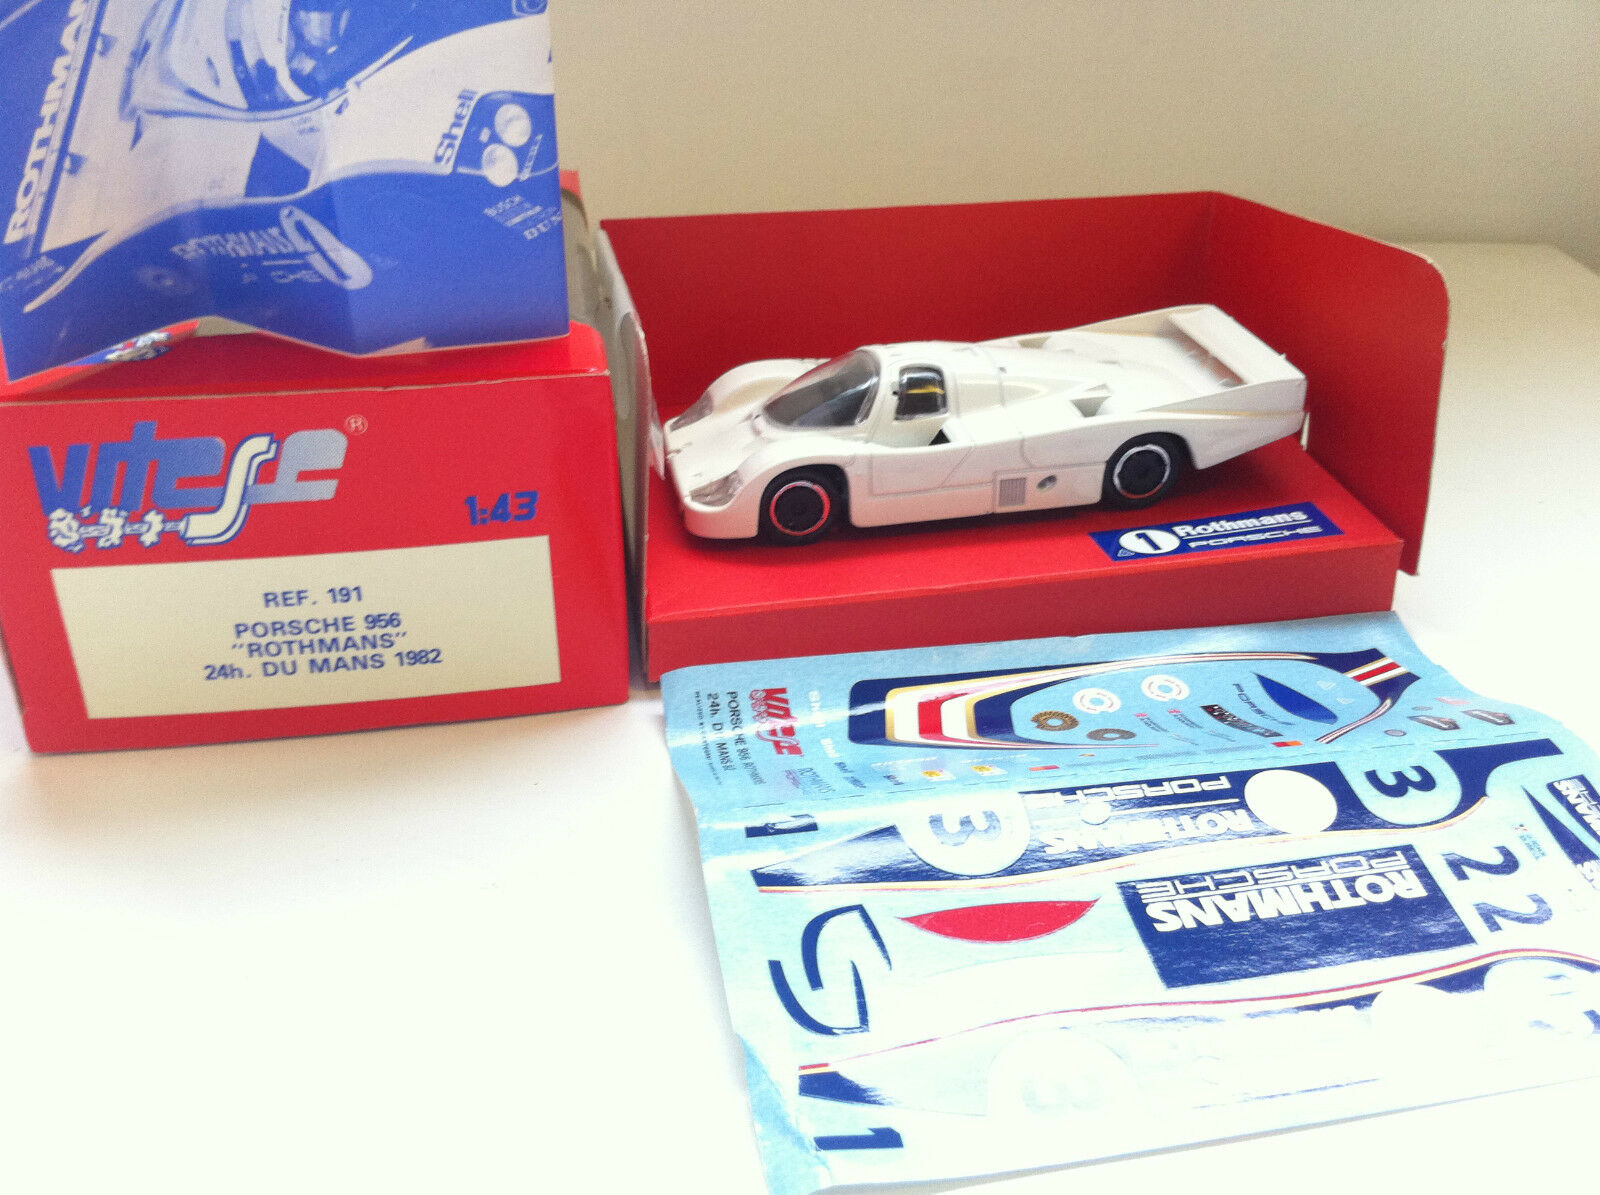 Vitesse - 191 - Porsche 956  rougehmans  24H du Mans 1982 (1 43)